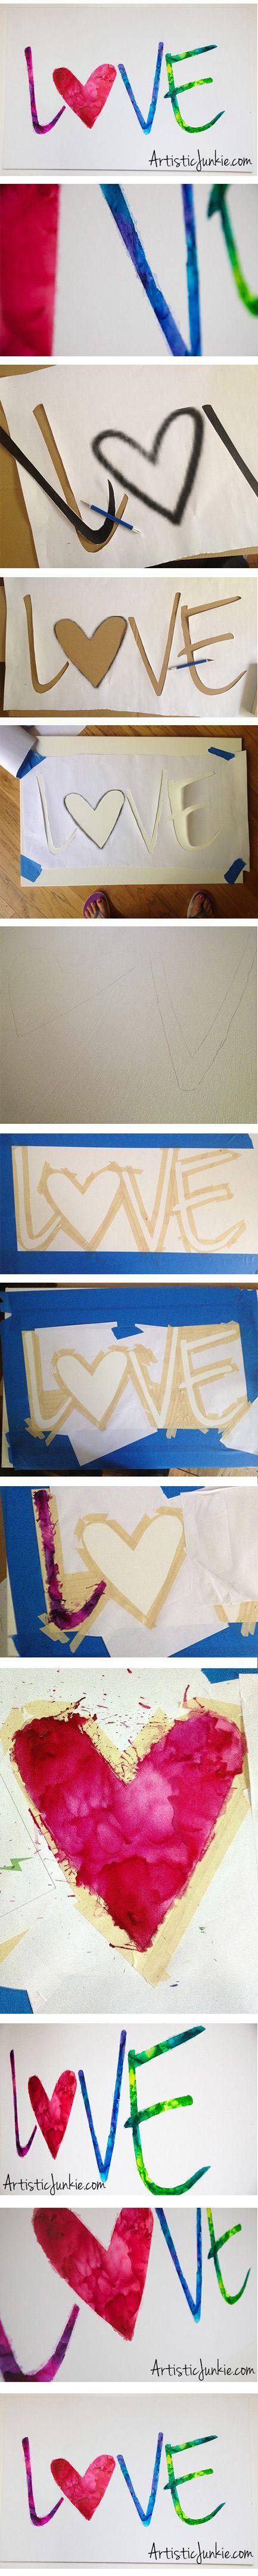 Love, Melted Crayon Art DIY tutorial